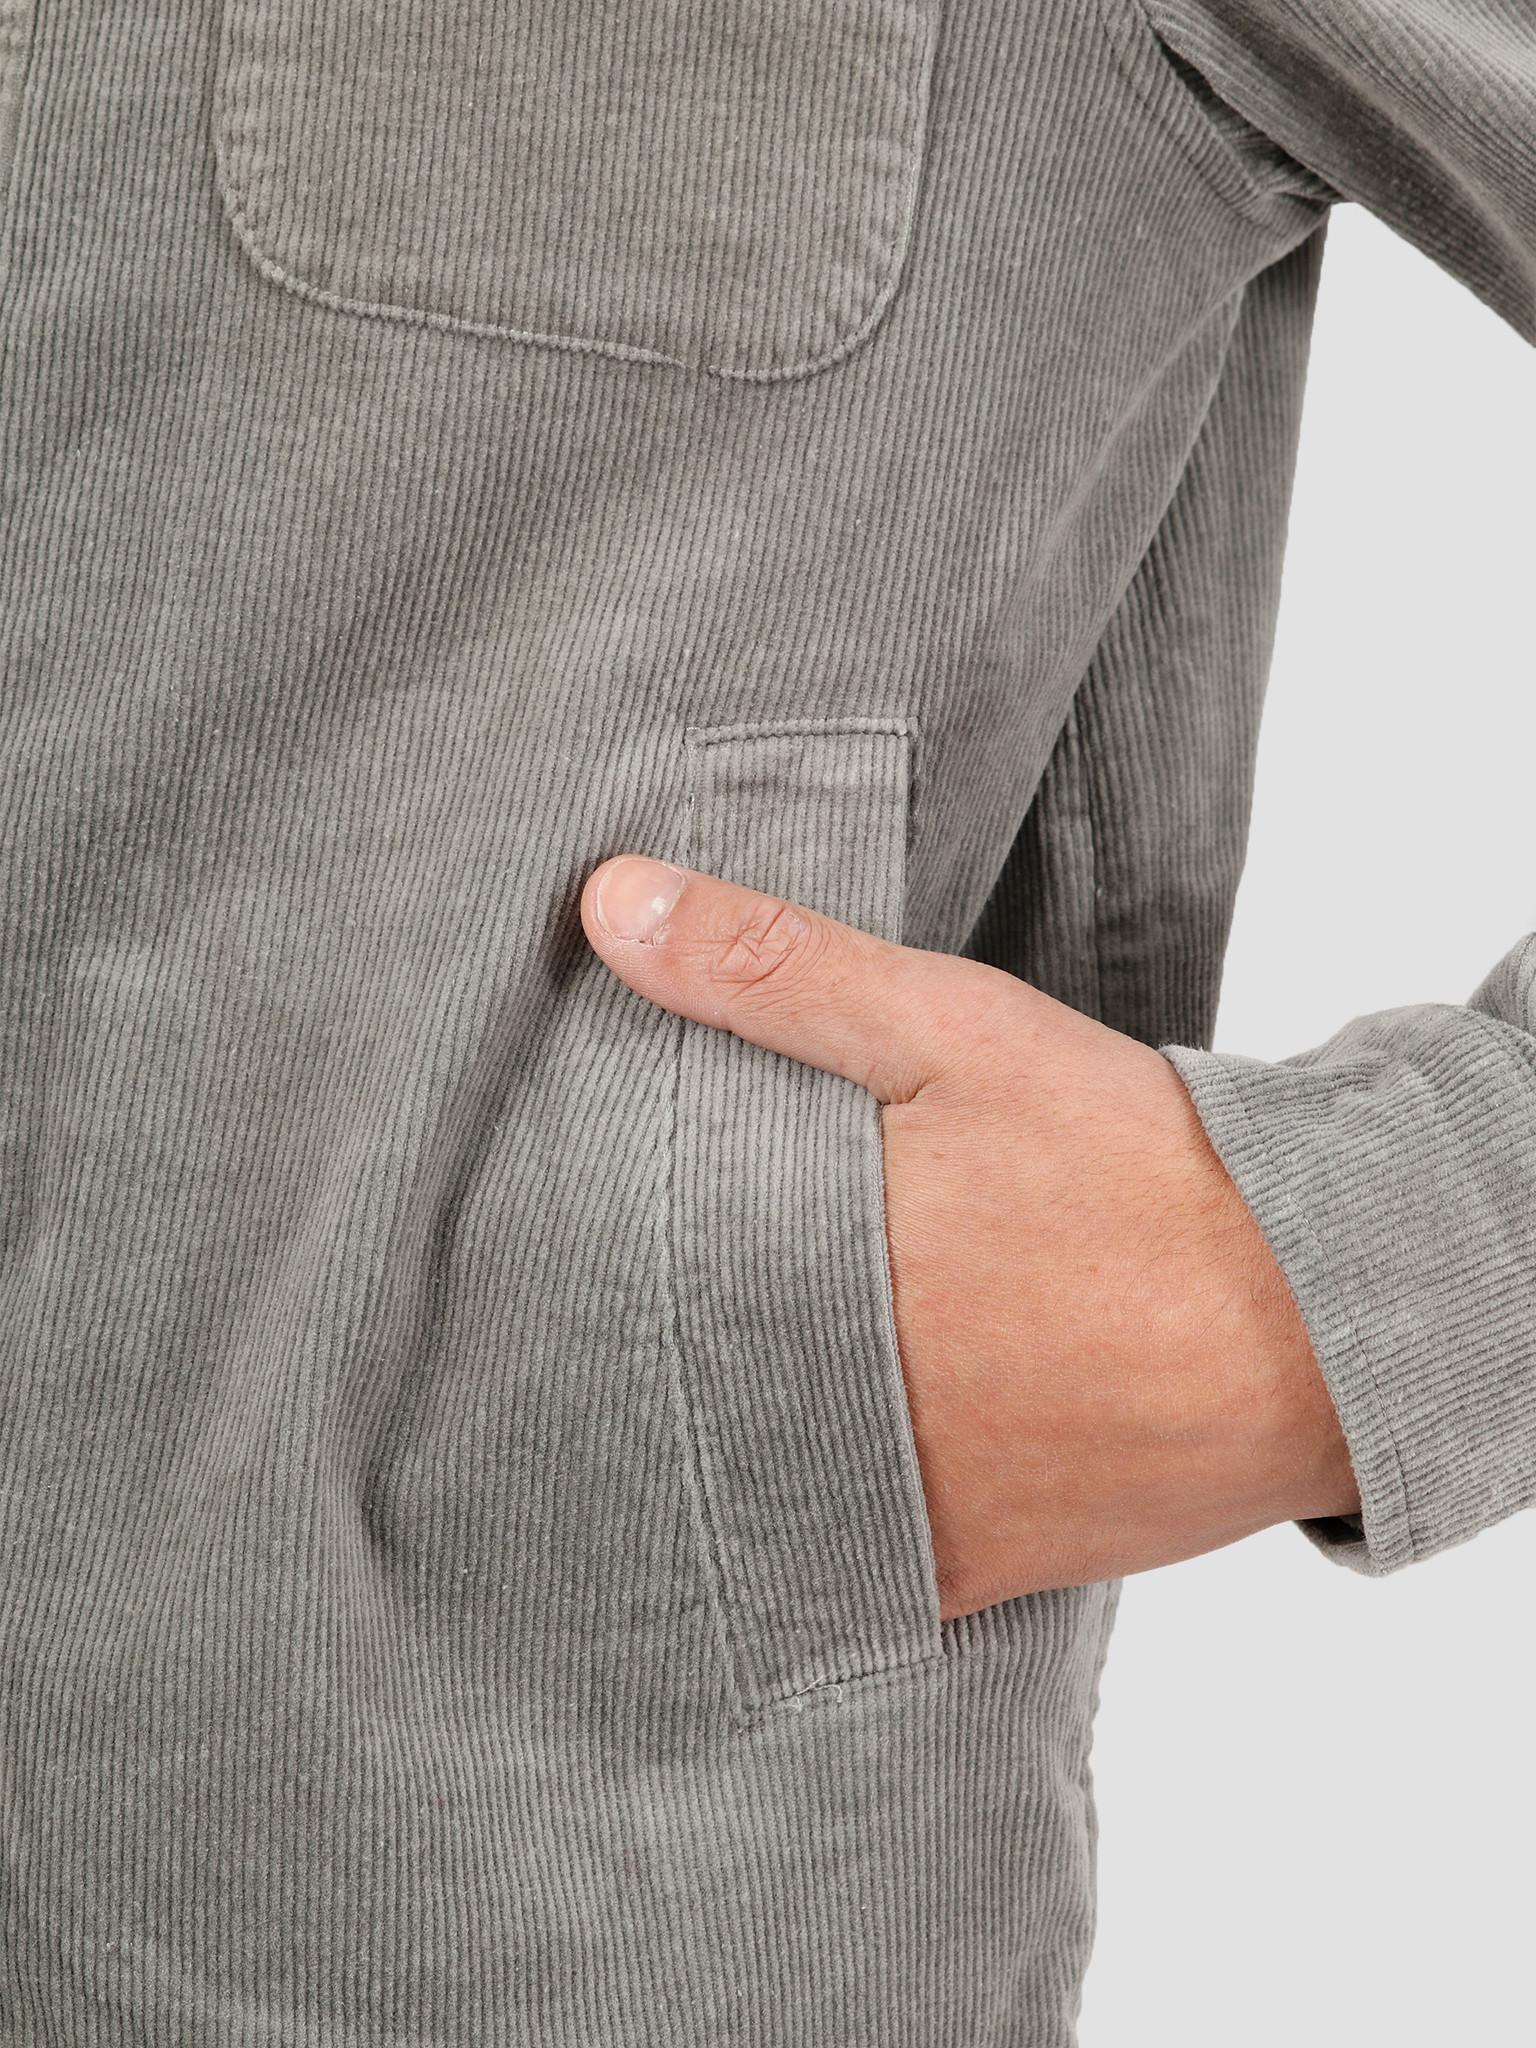 Wemoto Wemoto Conrad Jacket Olive 151.616-608